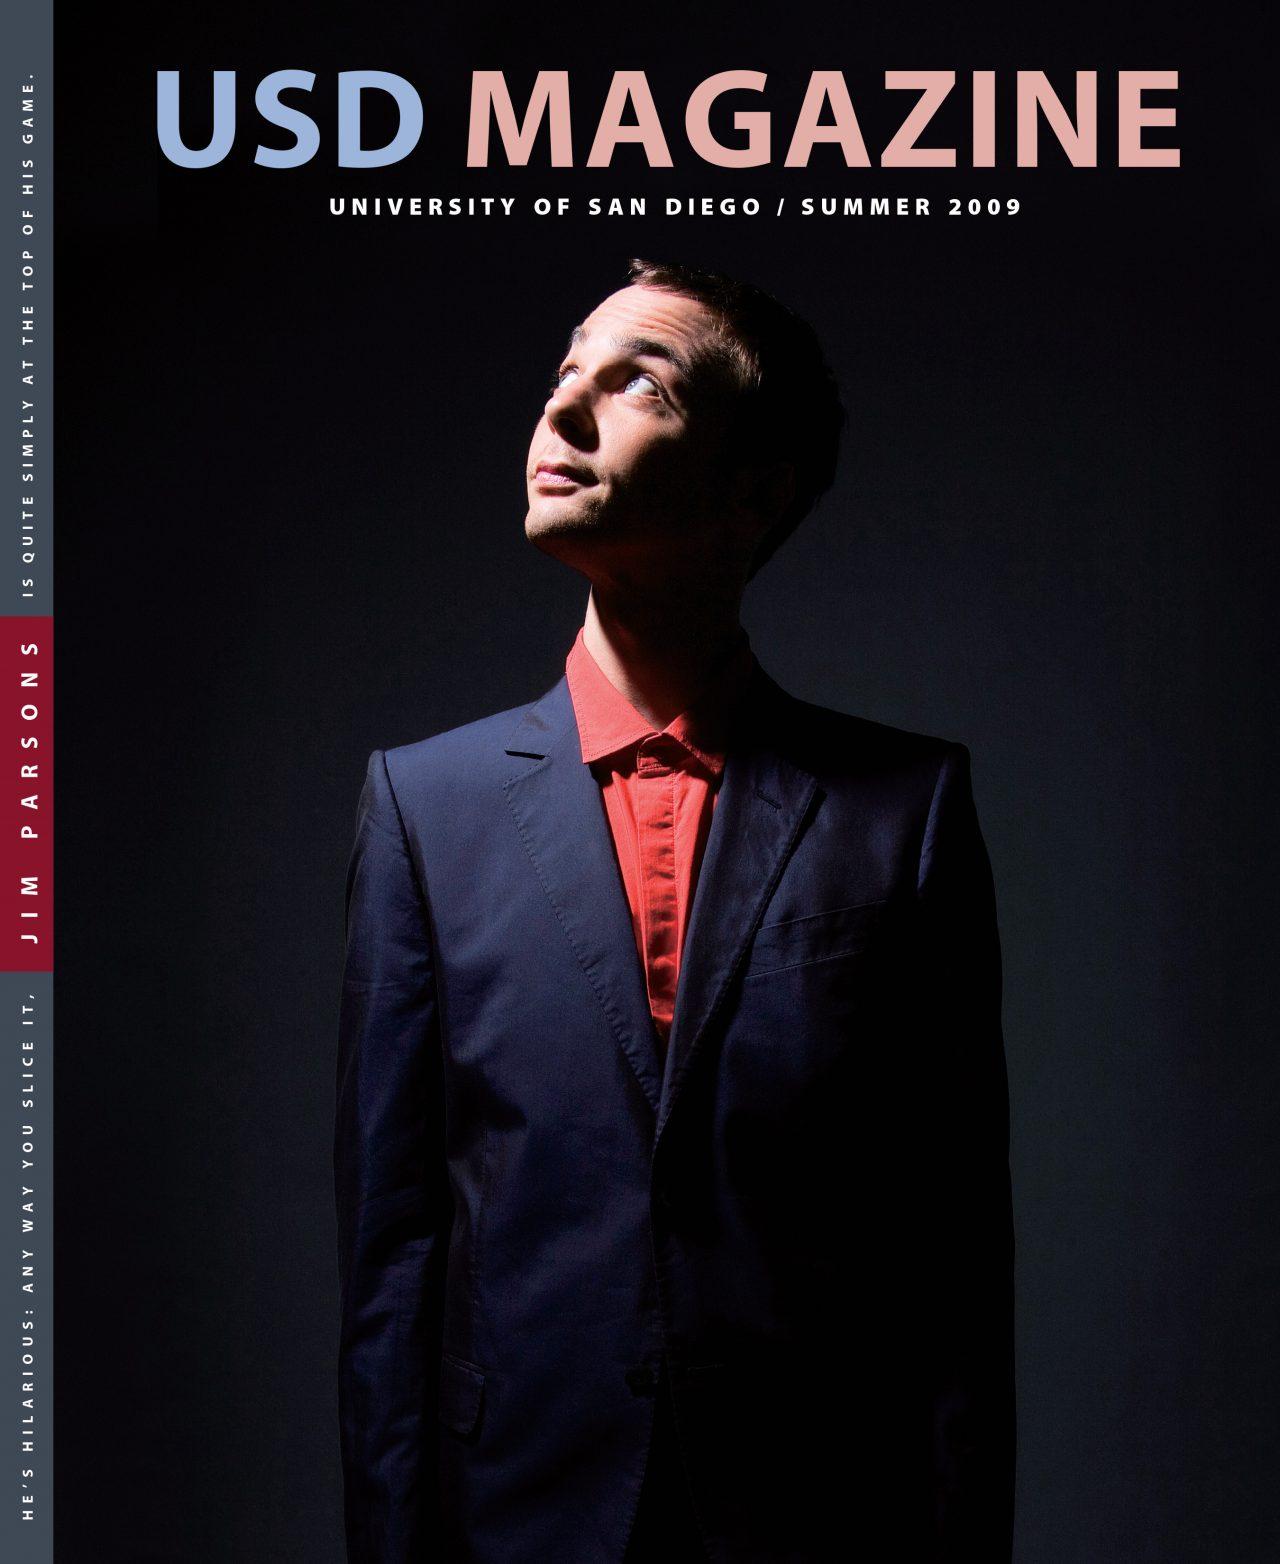 Summer 2009 USD Magazine cover